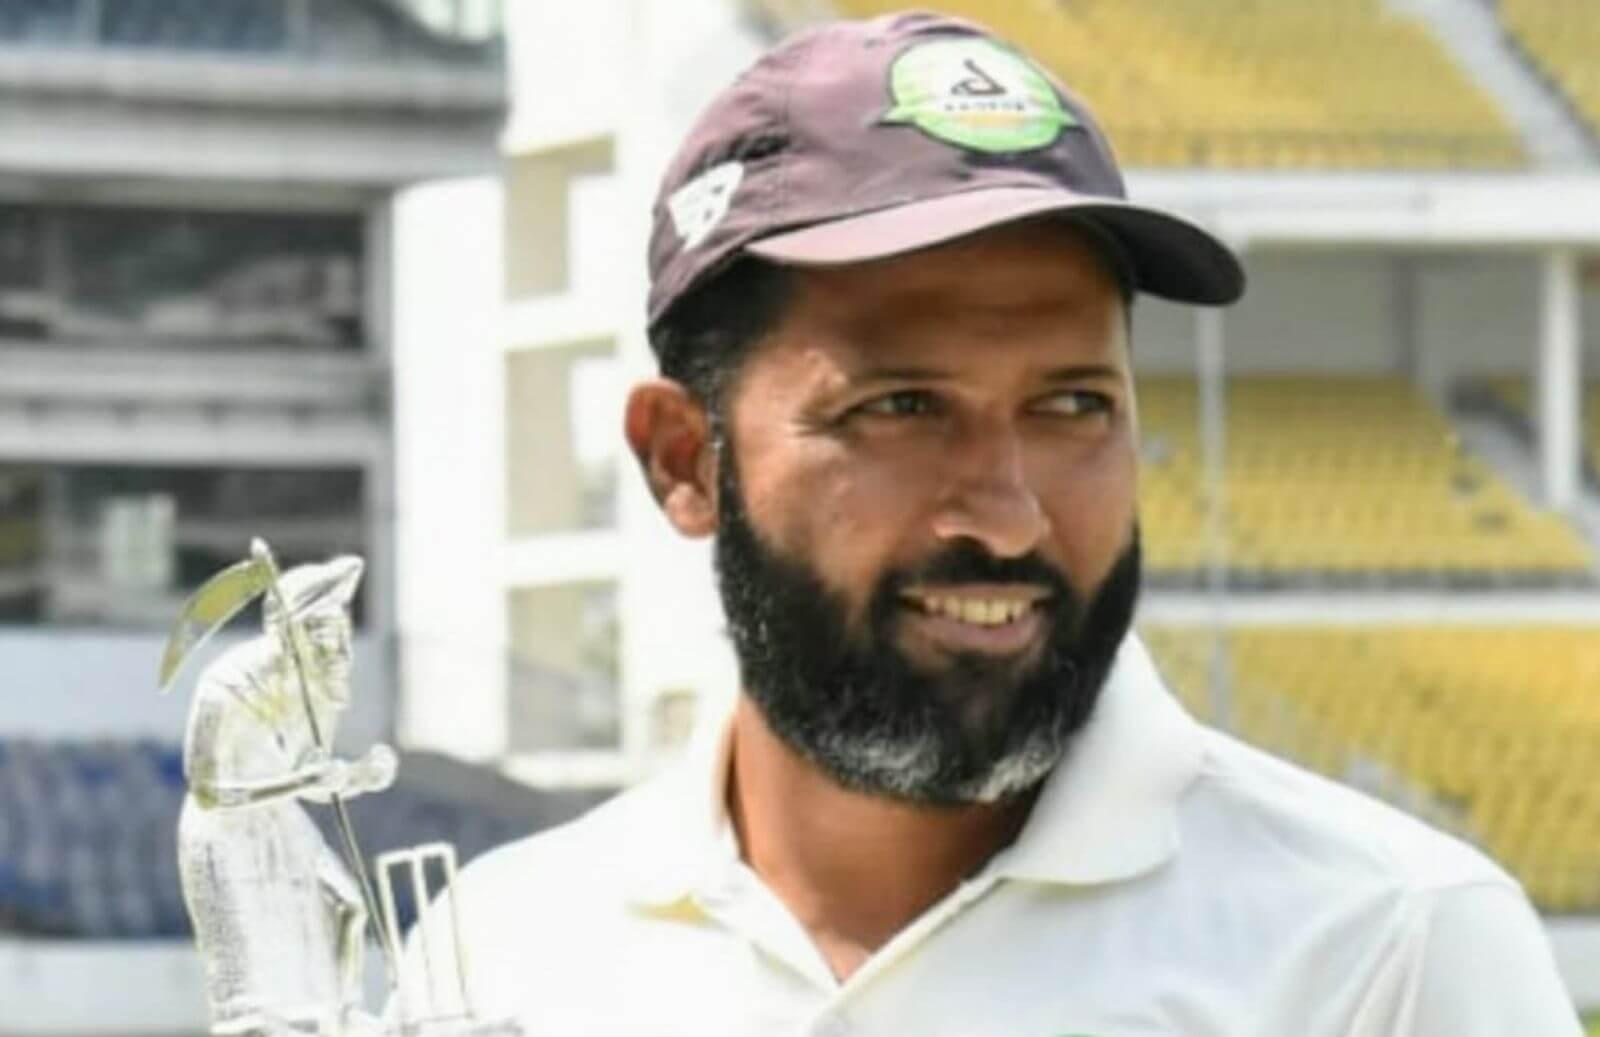 Yeh Btanei Kei Liye Tum Post Kerdiye,_- Wasim Jaffer Hilariously Trolls Cricket Australia For Mocking Virat Kohli's 11-Run Innings